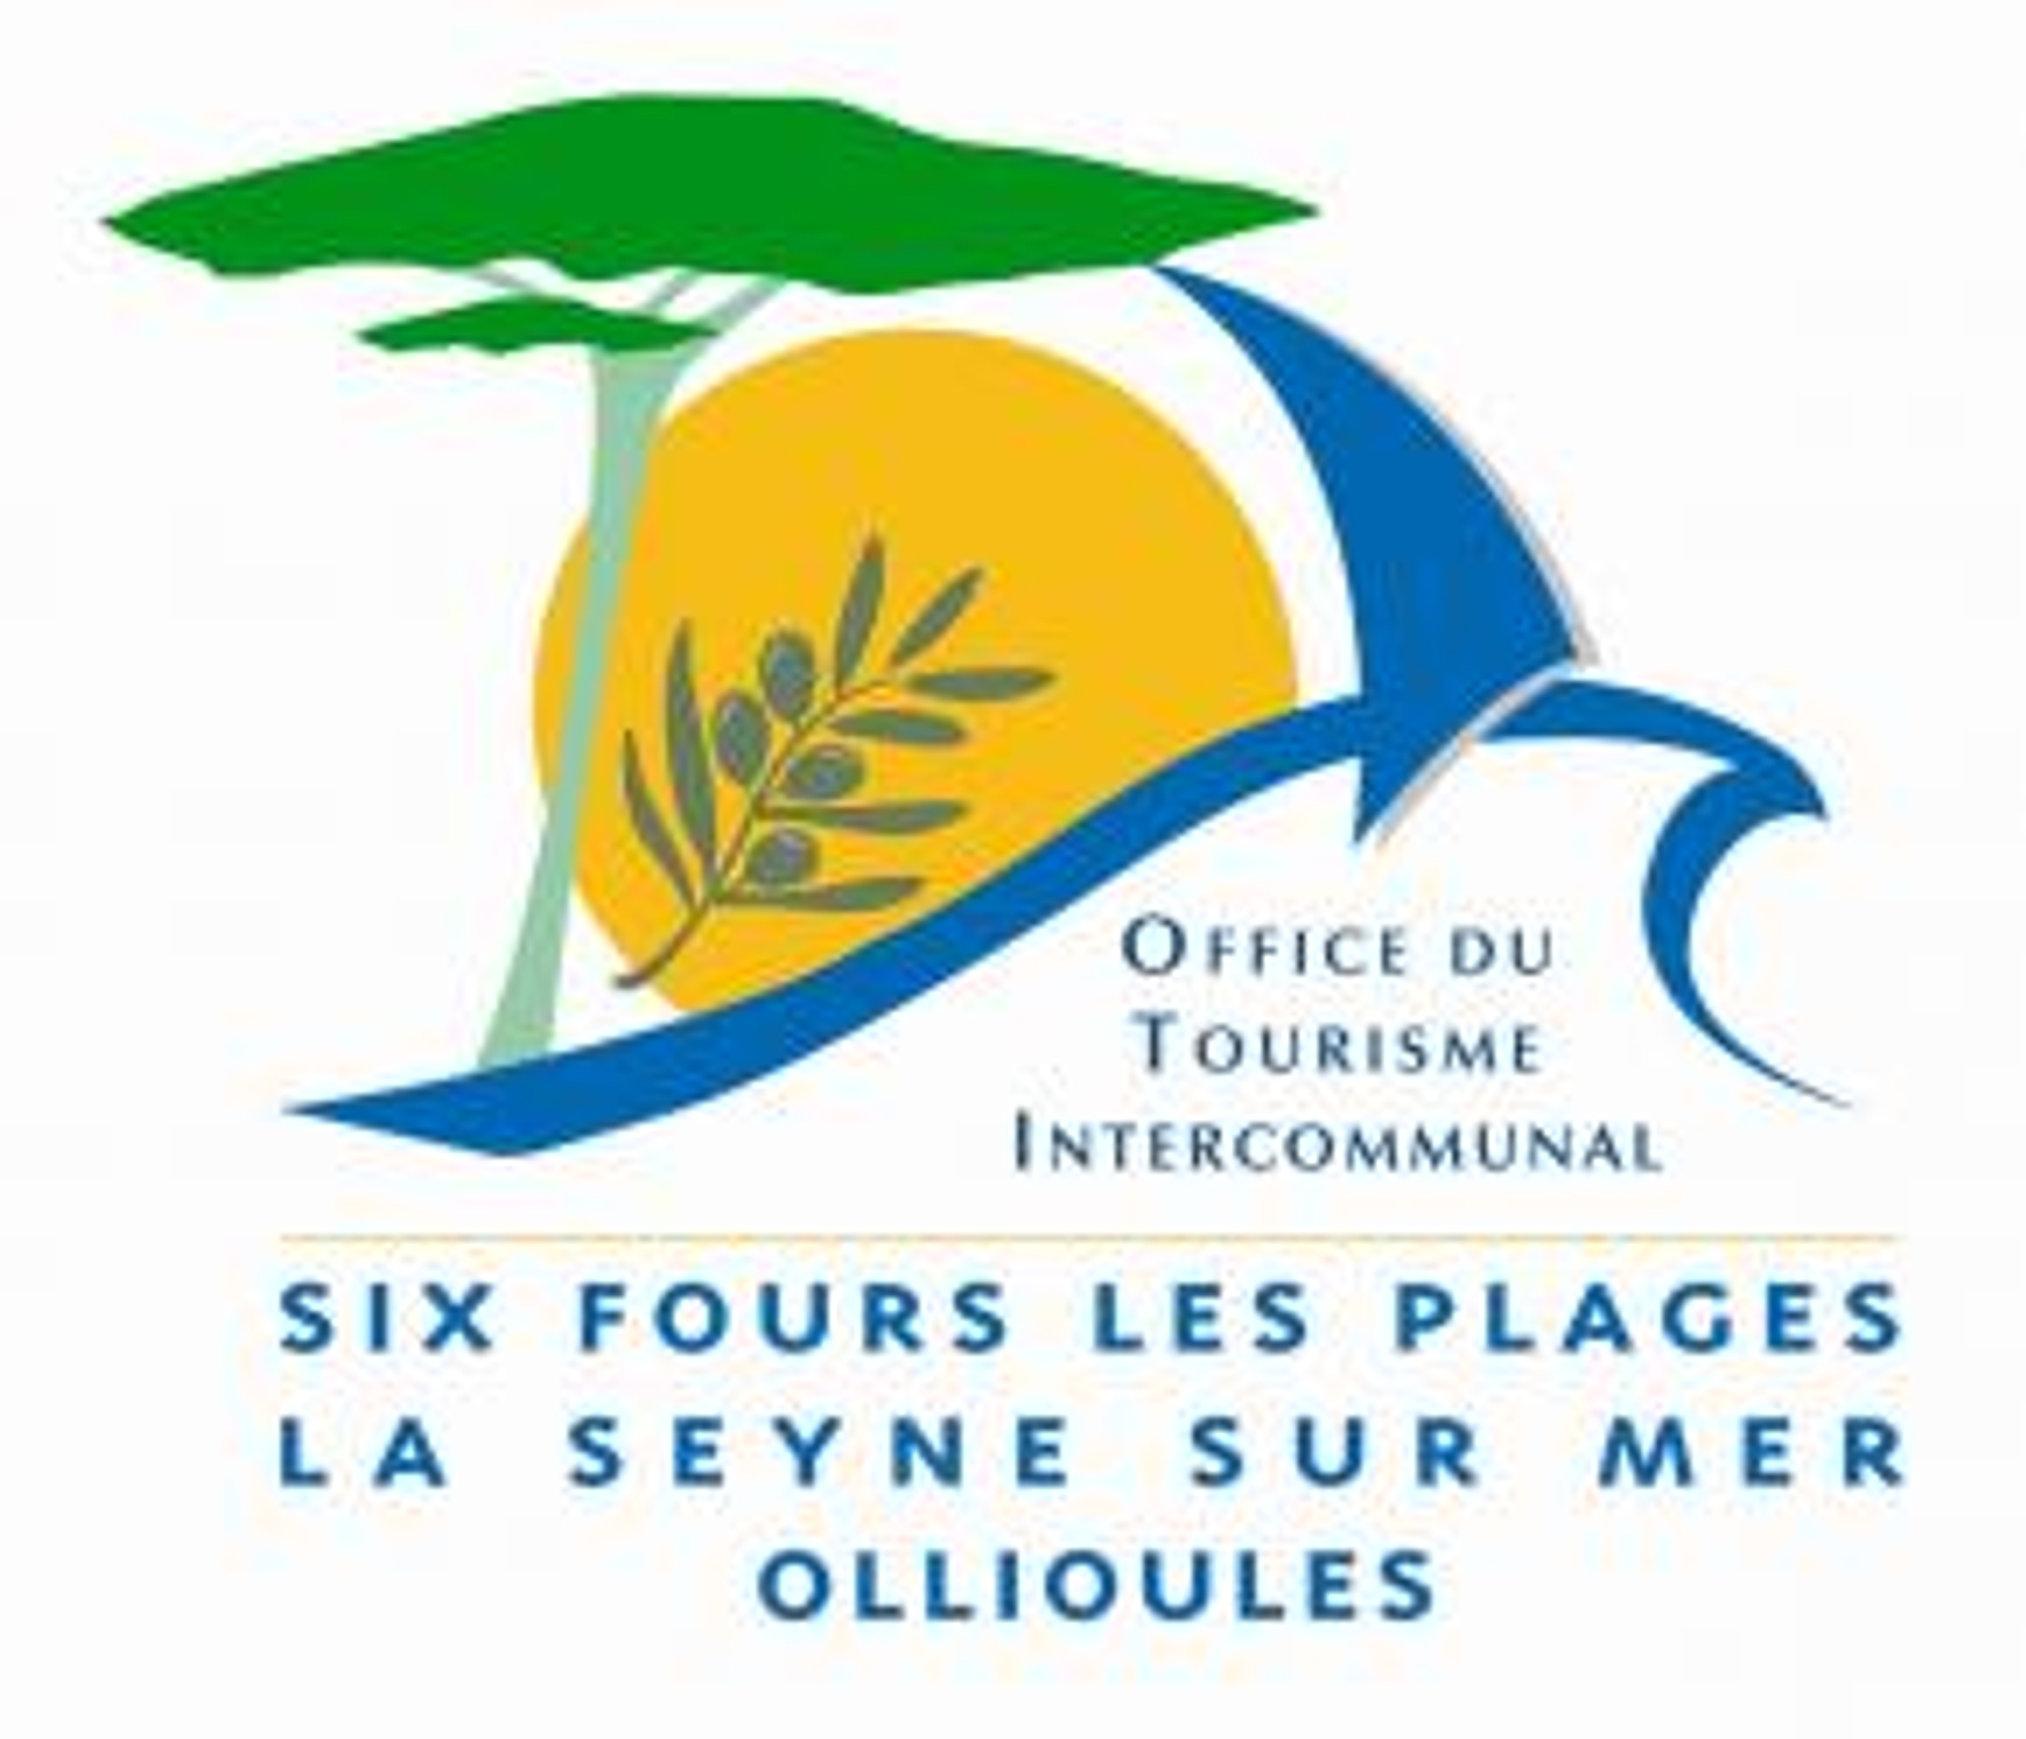 Bateliers de la rade visite rade de toulon porquerolles - Office de tourisme de porquerolles ...